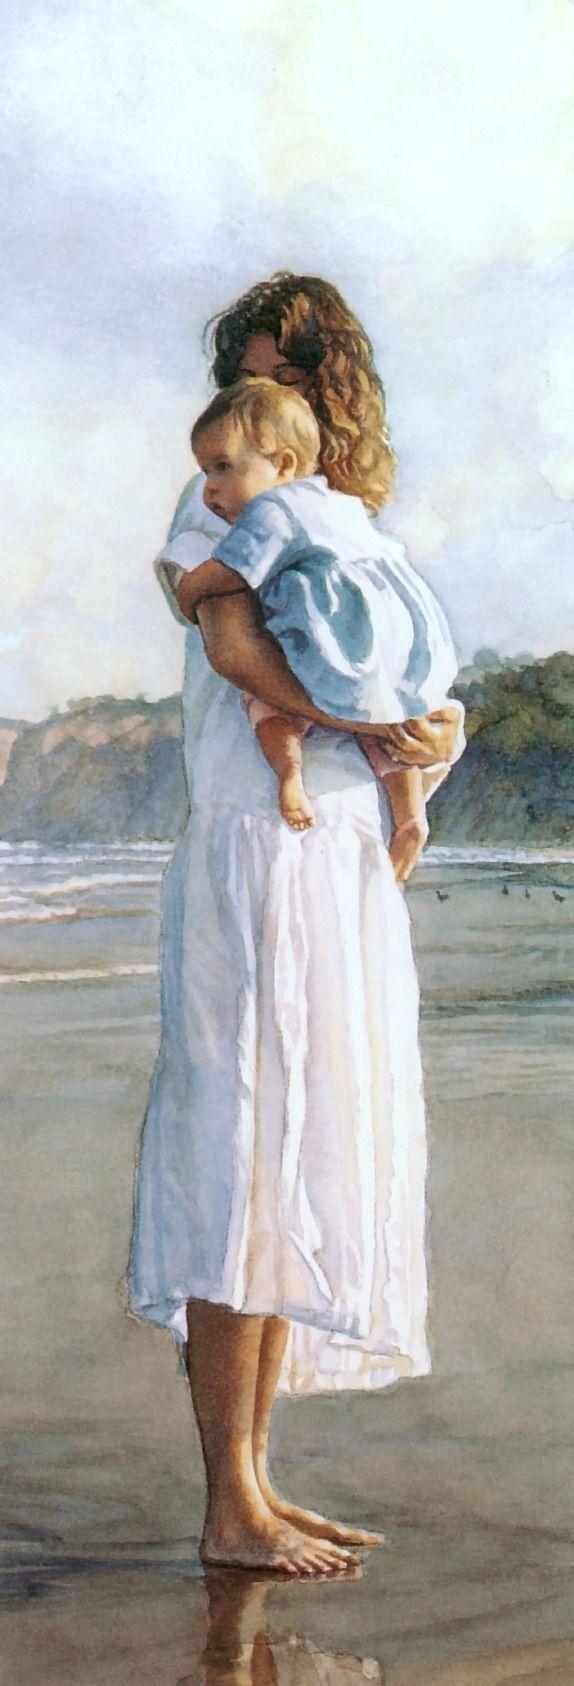 Steve Hanks - In Mothers Arms